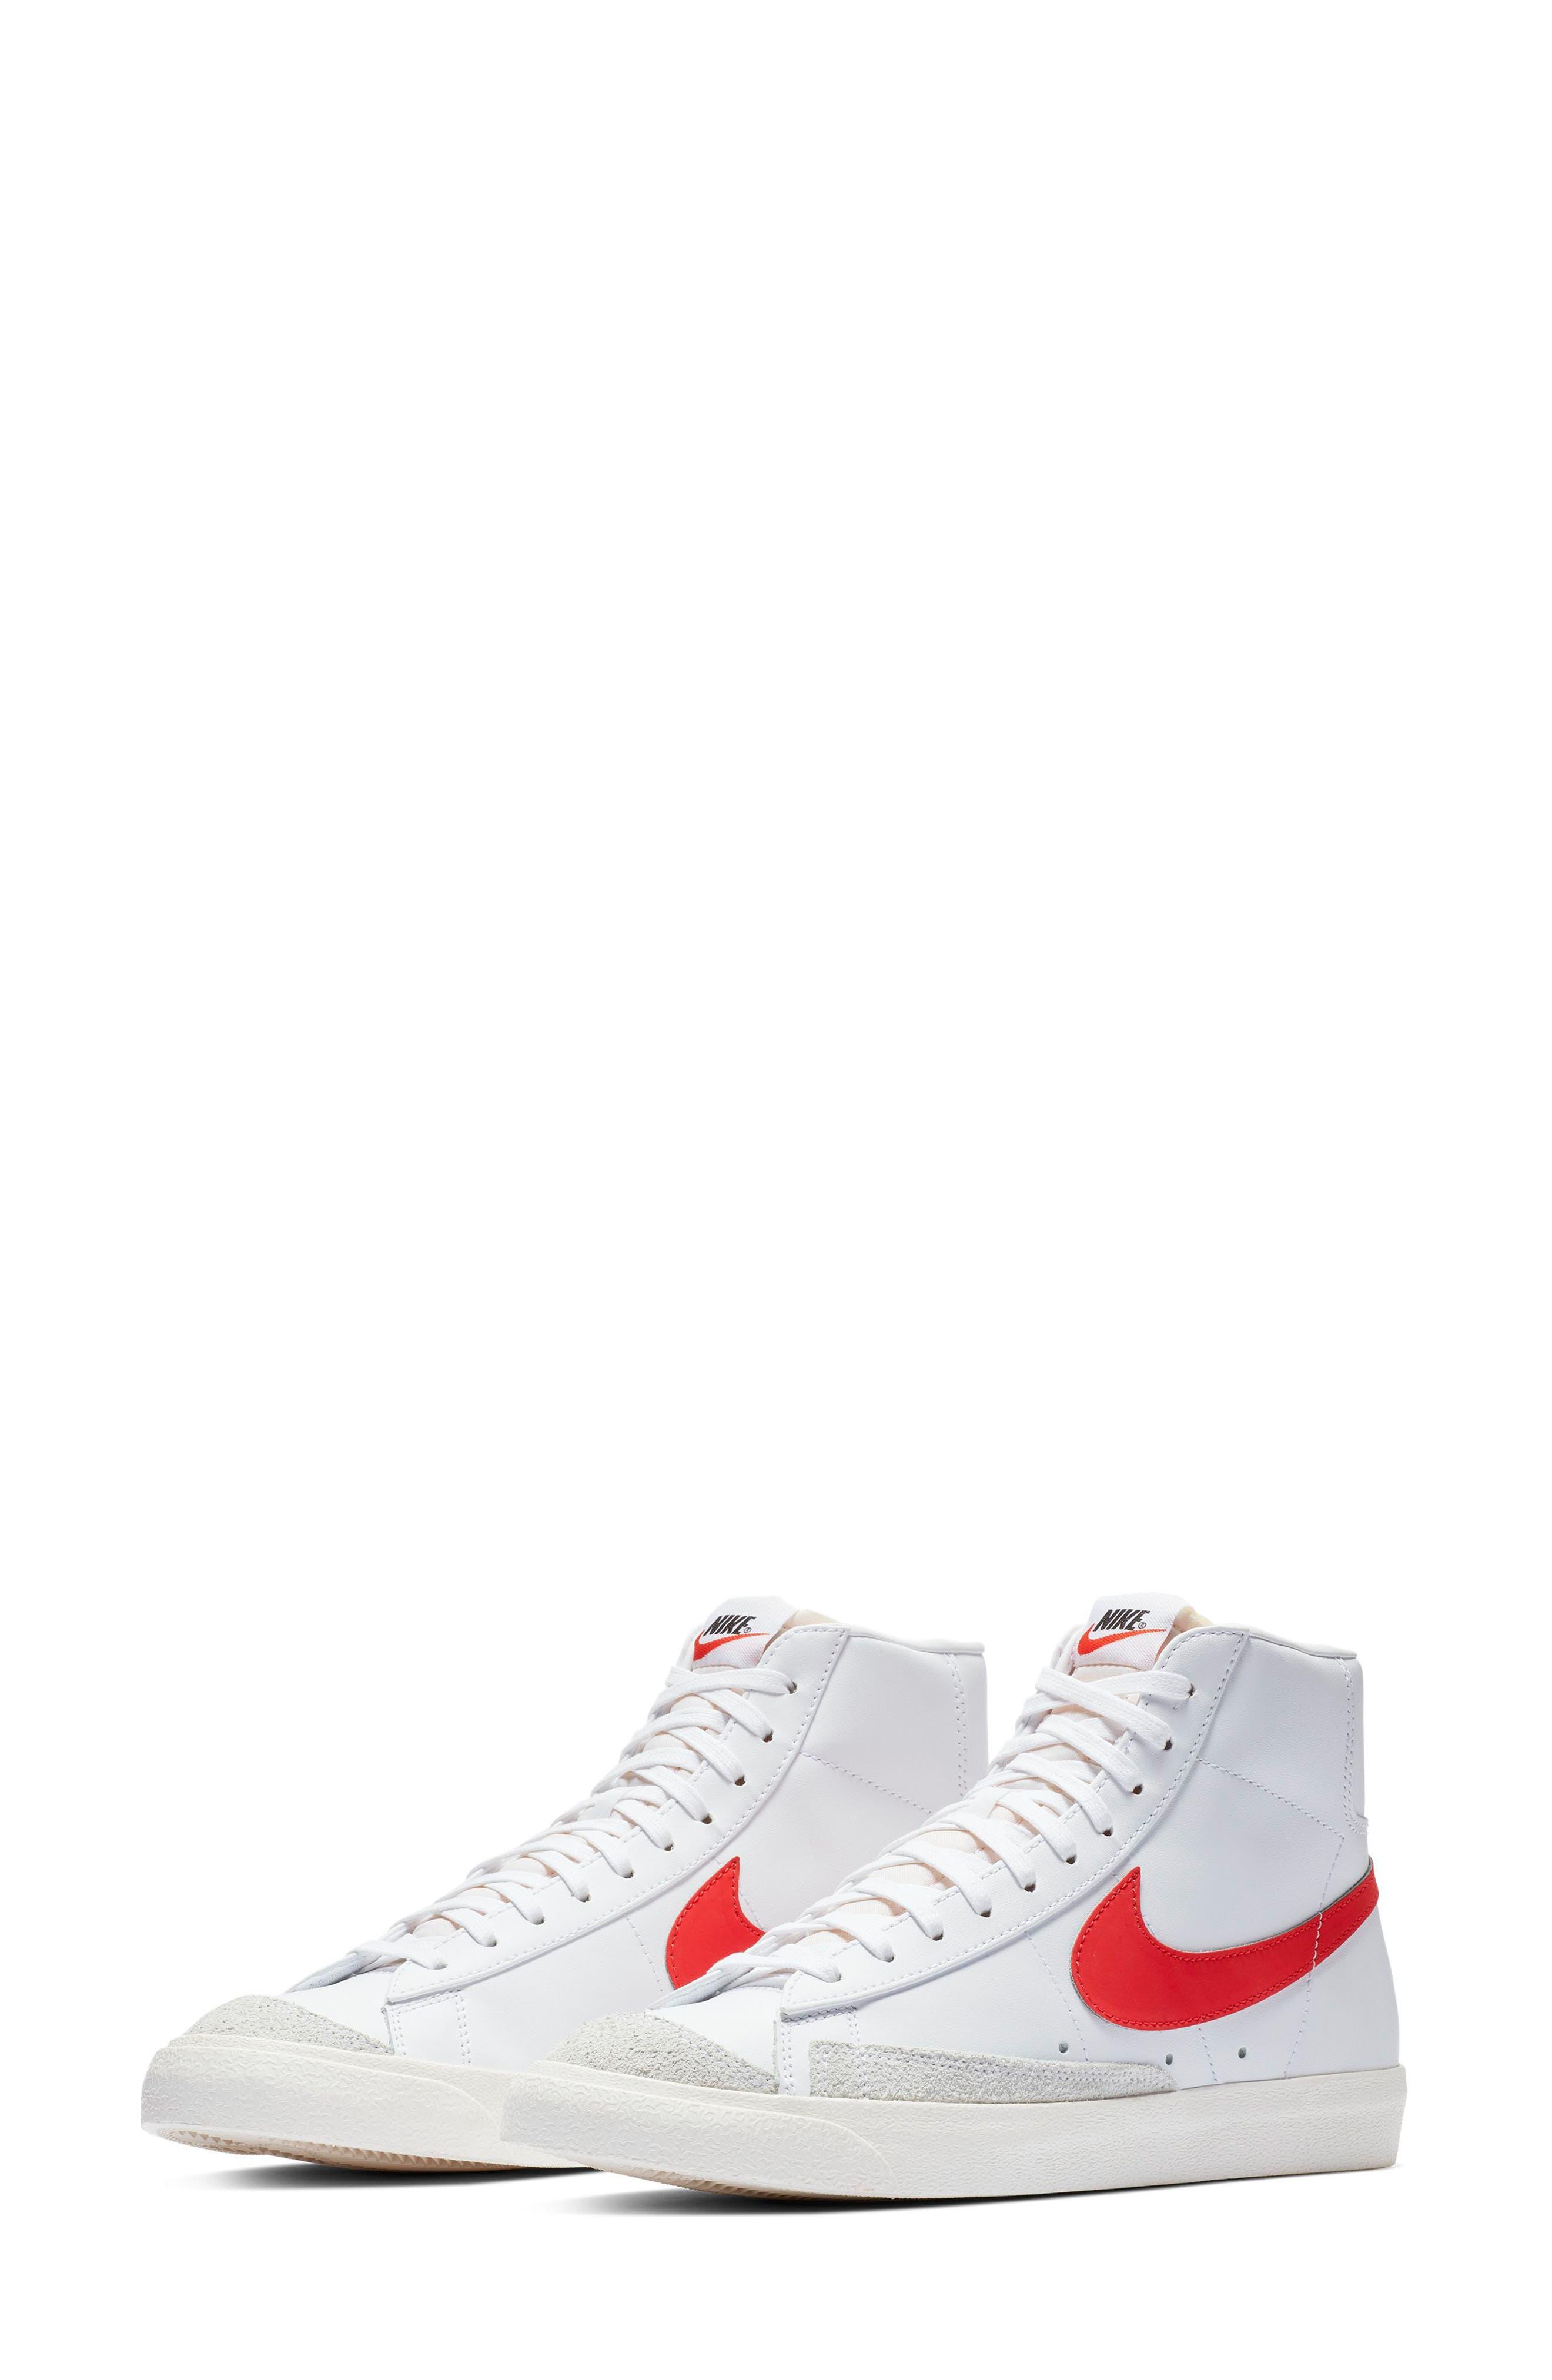 Blazer Mid '77 Vintage Sneaker,                             Main thumbnail 1, color,                             HABANERO RED/ SAIL/ WHITE